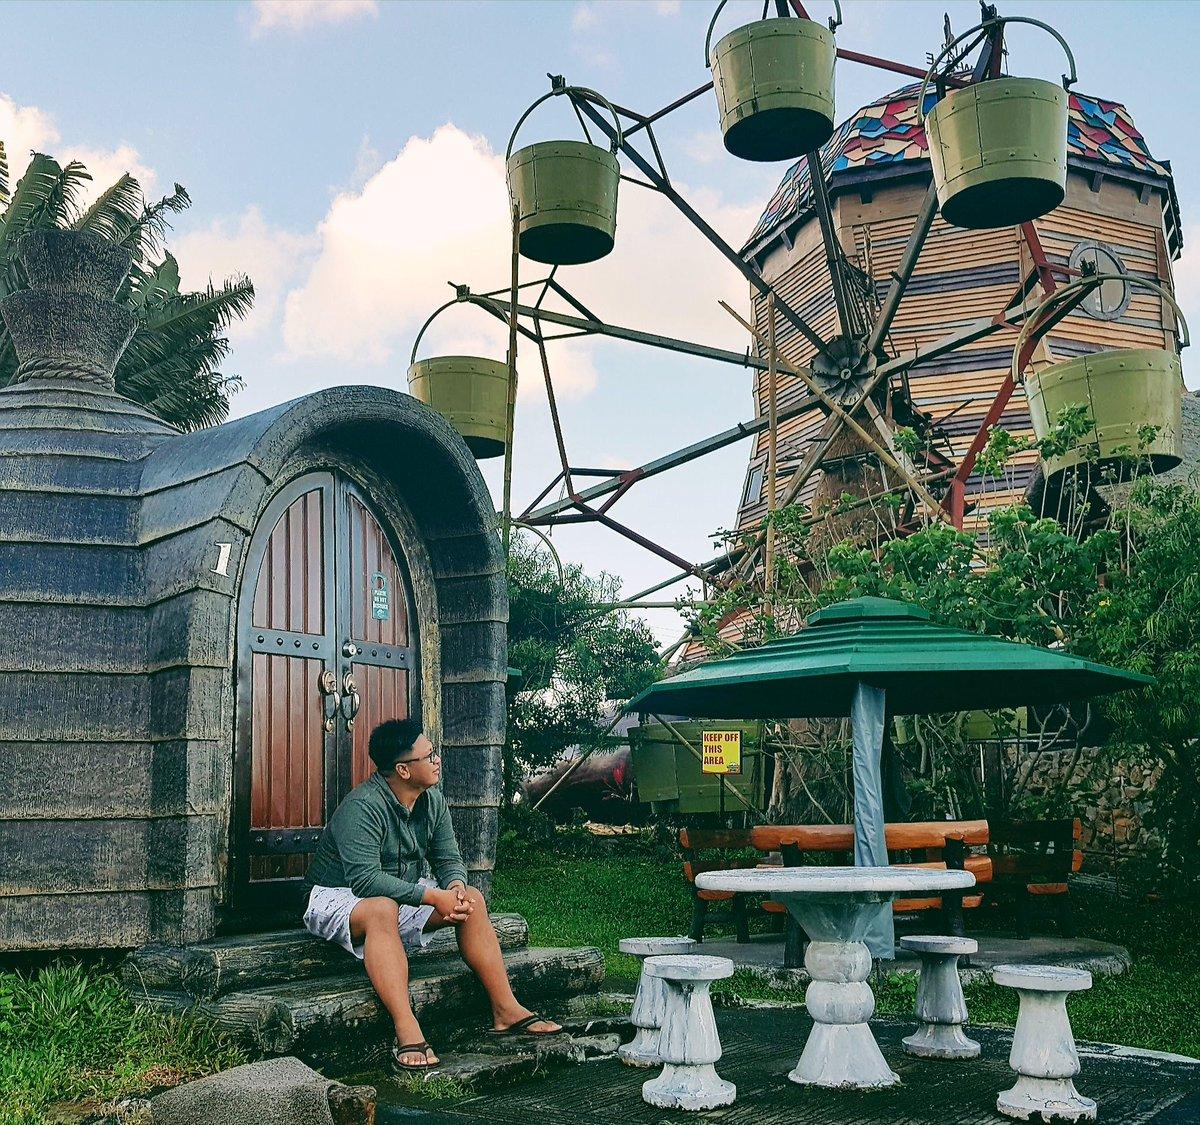 """A safe fairyland is untrue to all worlds.""  ~ J.R.R. Tolkien, The Hobbit  #Wanderlust #fantasy #adventure #solotravel #travelphoto #Philippines #bacolod #itsmorefuninthephilippines #travel2018 #travelpic.twitter.com/ijP9mTxnrJ"